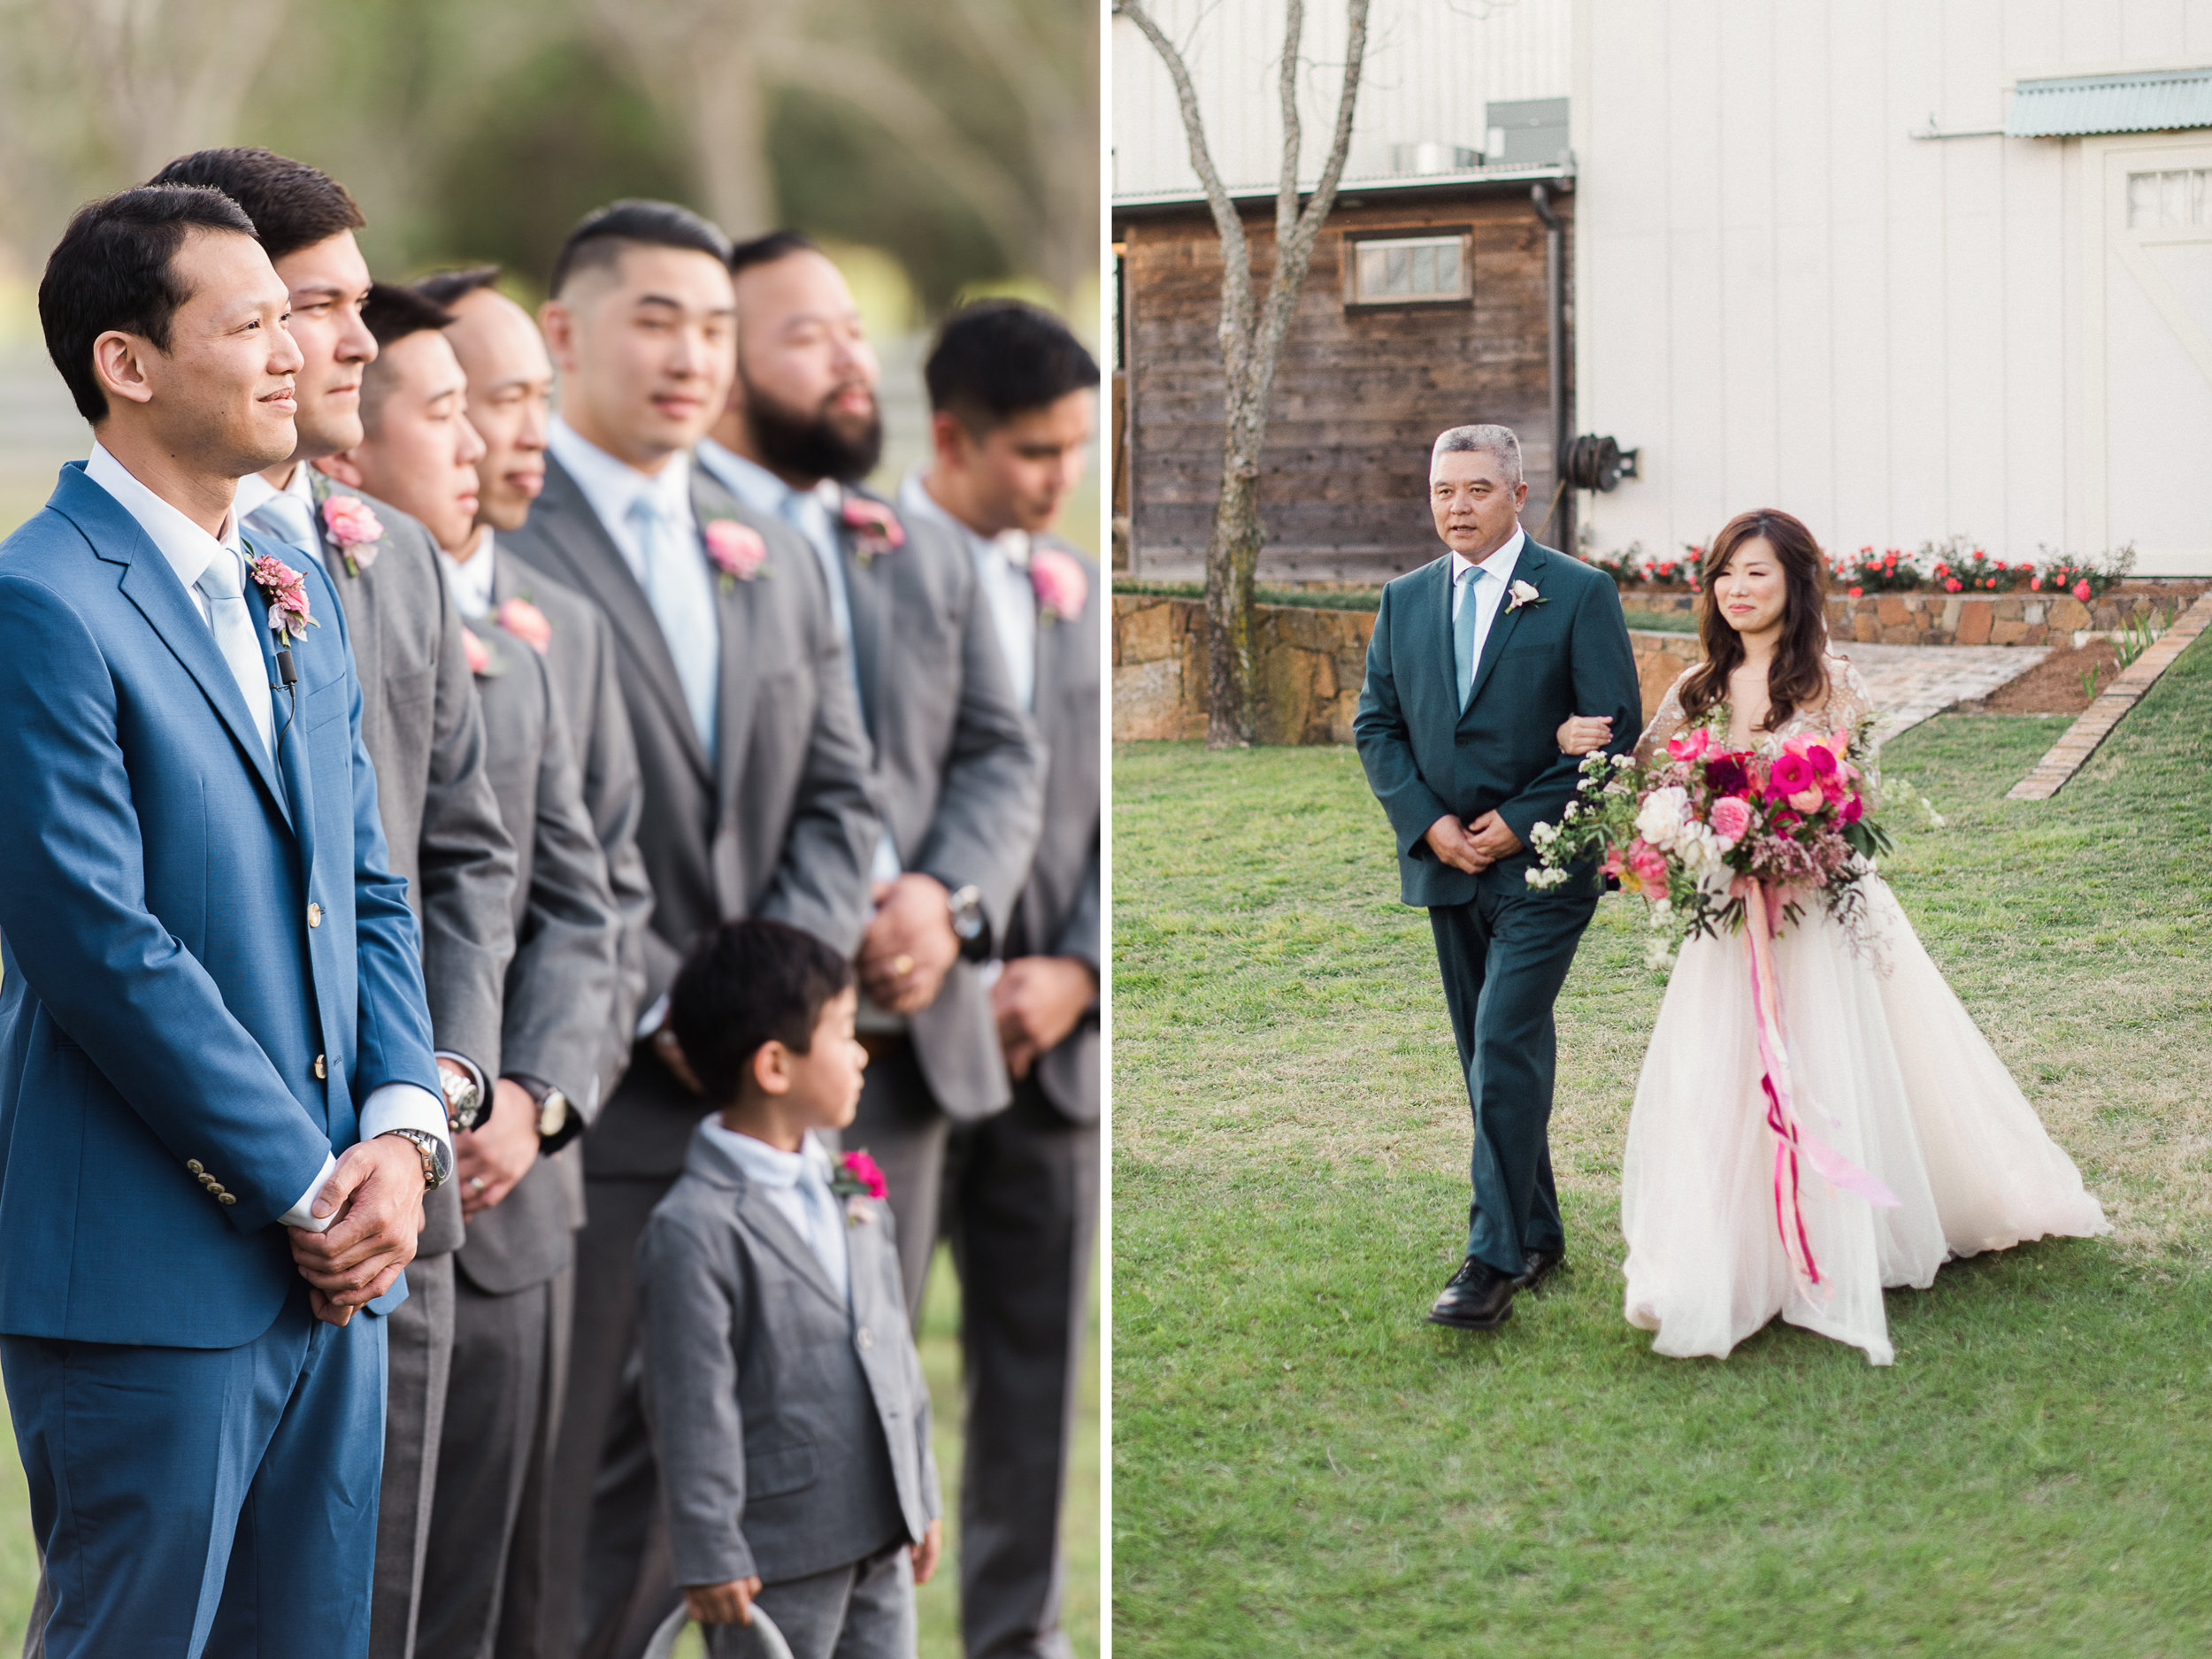 The-Knot-50-Weddings-50-States-Texas-Winner-Dana-Fernandez-photography-houston-wedding-photographer-film-fine-art-destination-151.jpg